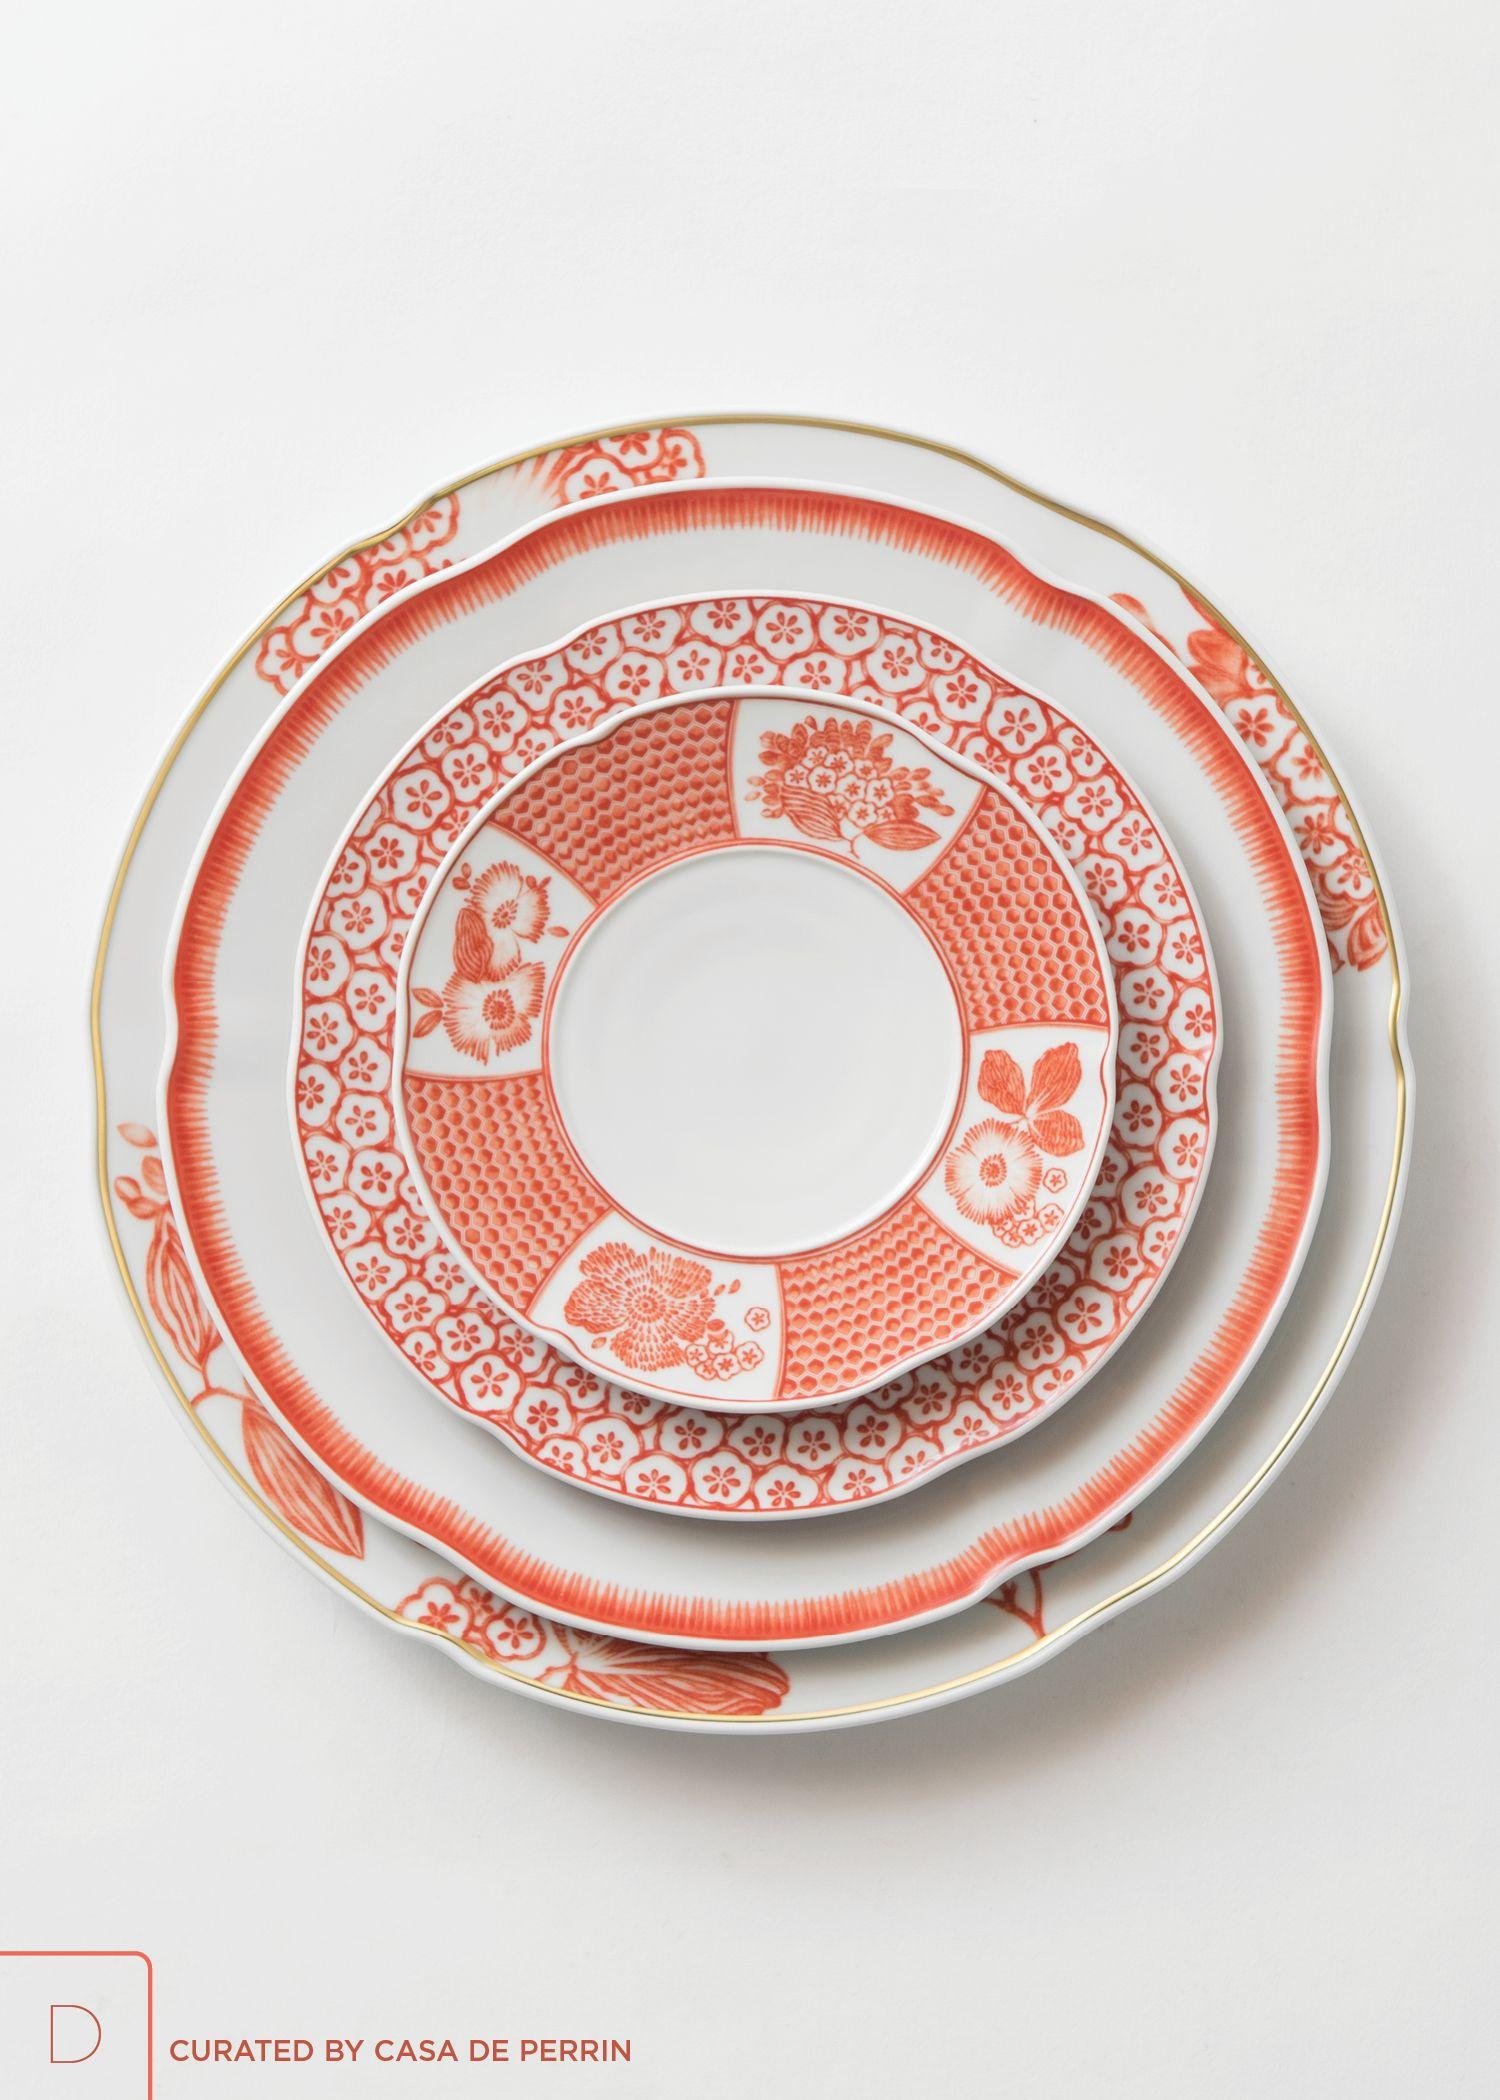 Oscar De La Renta Coralina Dinnerware Floral Motif Plate Design